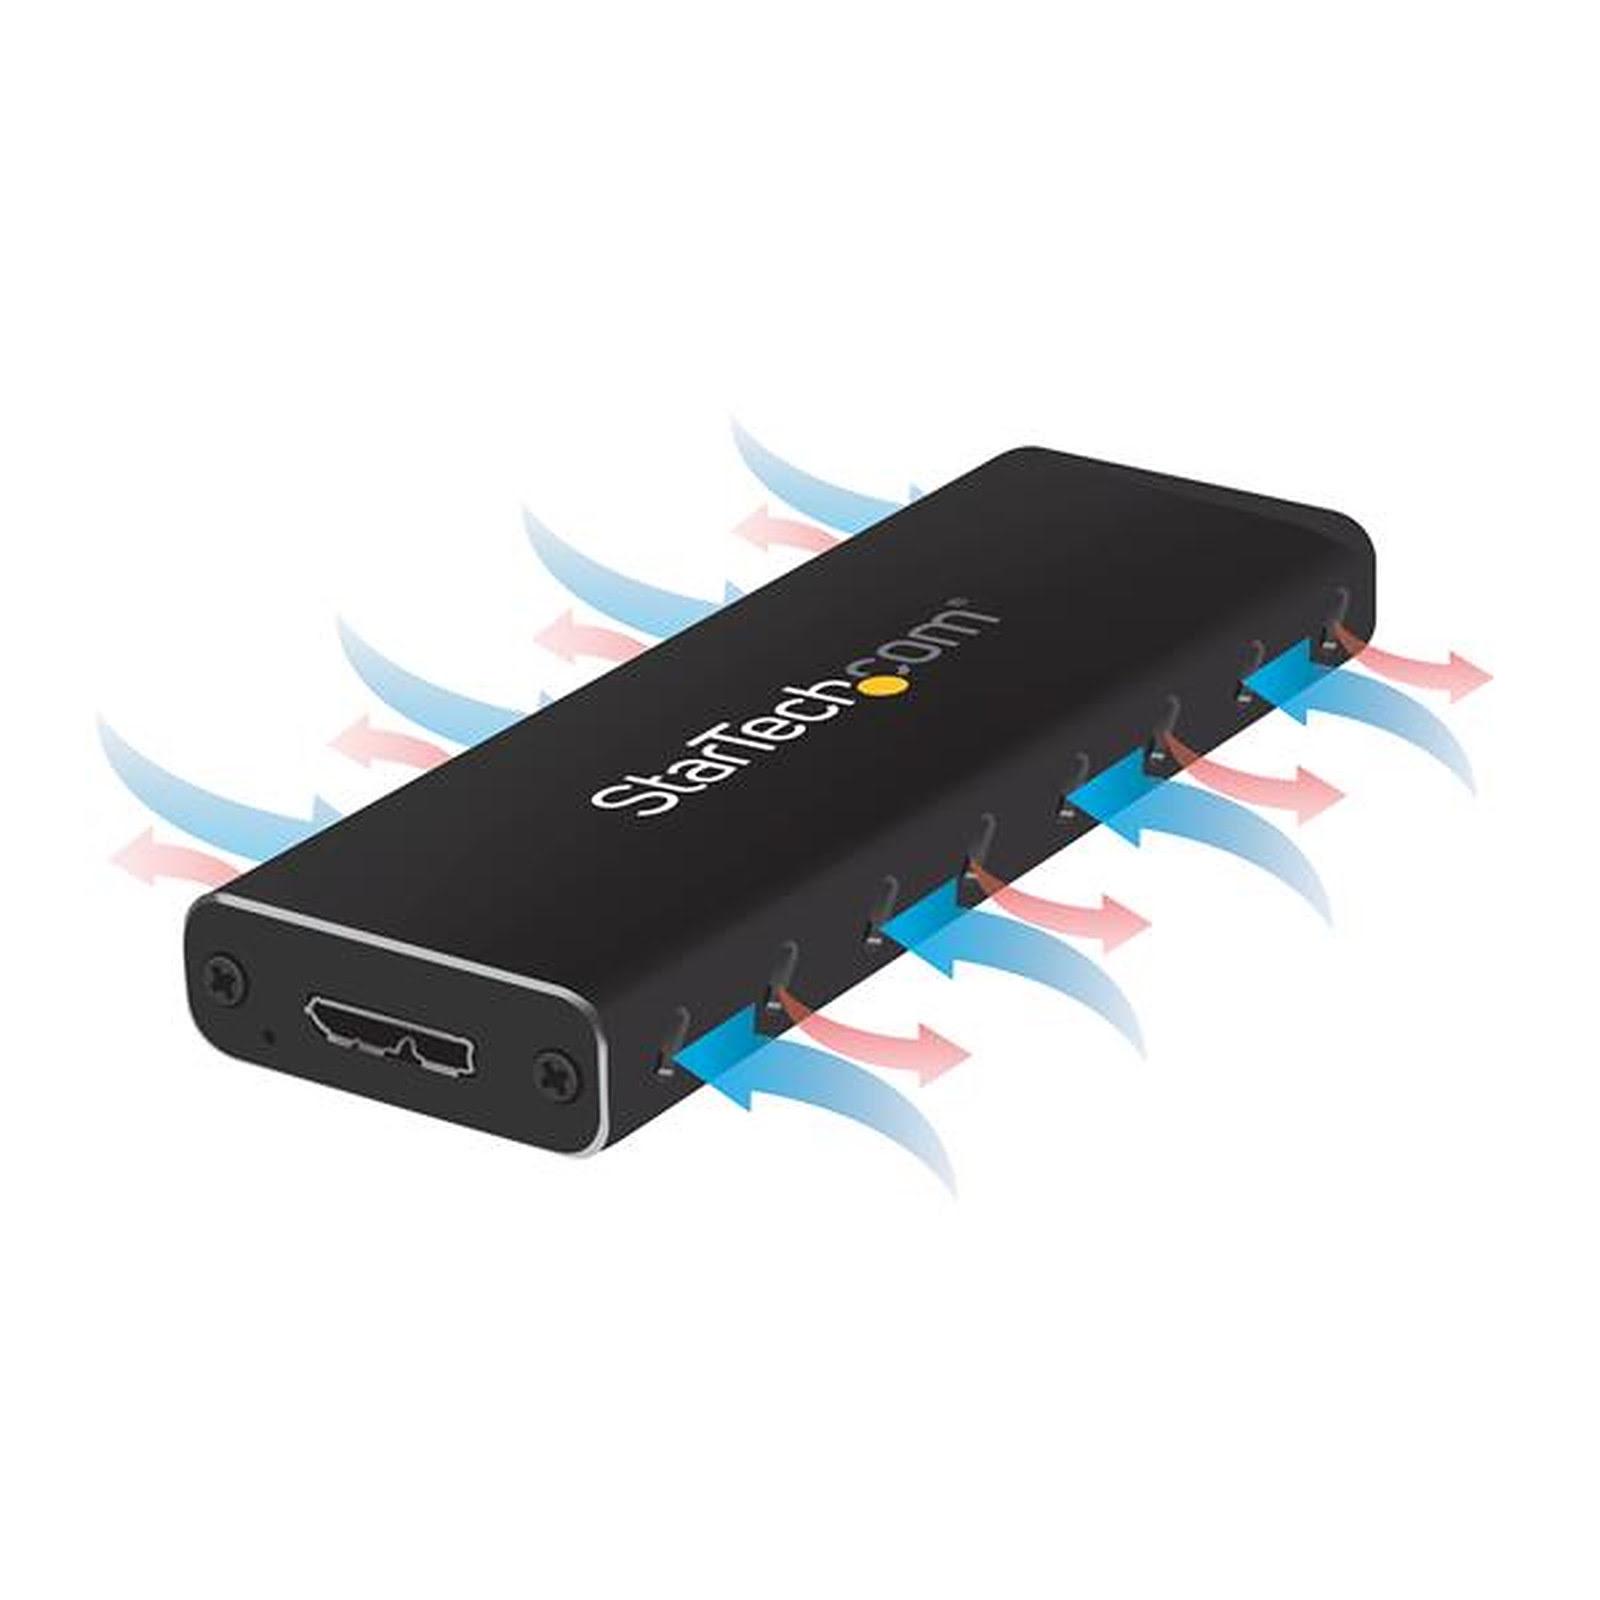 StarTech USB 3.0 pour SSD SATA M.2 - Boîtier externe - Cybertek.fr - 1